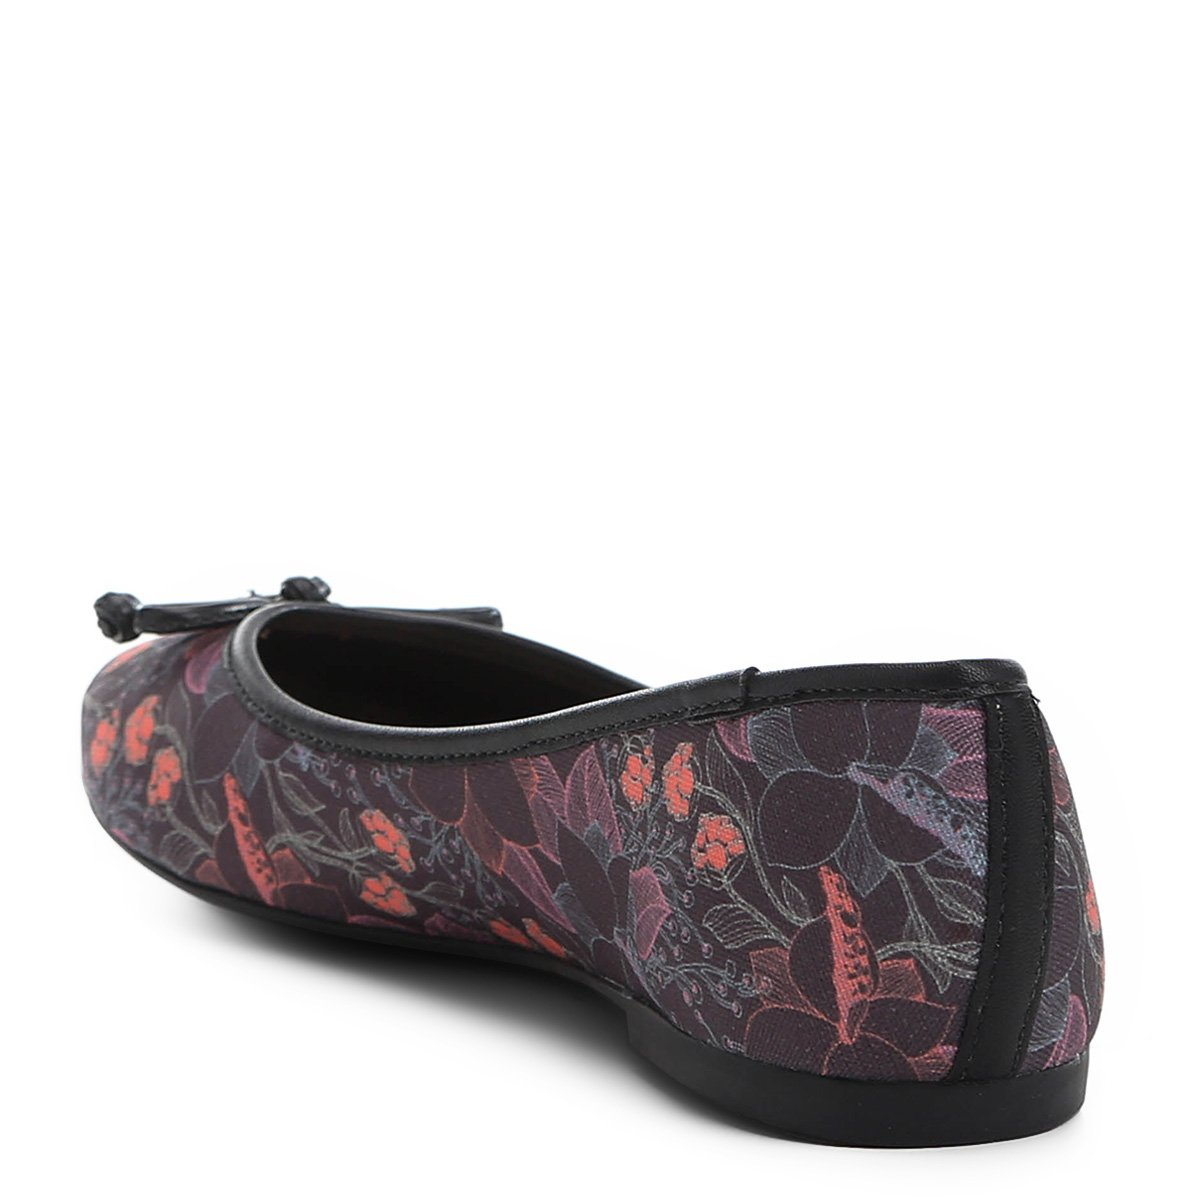 Rosa Shoestock Preto Sapatilha Sapatilha Rosa Bico Shoestock Redondo Redondo Preto Feminina Estampada e Estampada Bico e Feminina SawBq